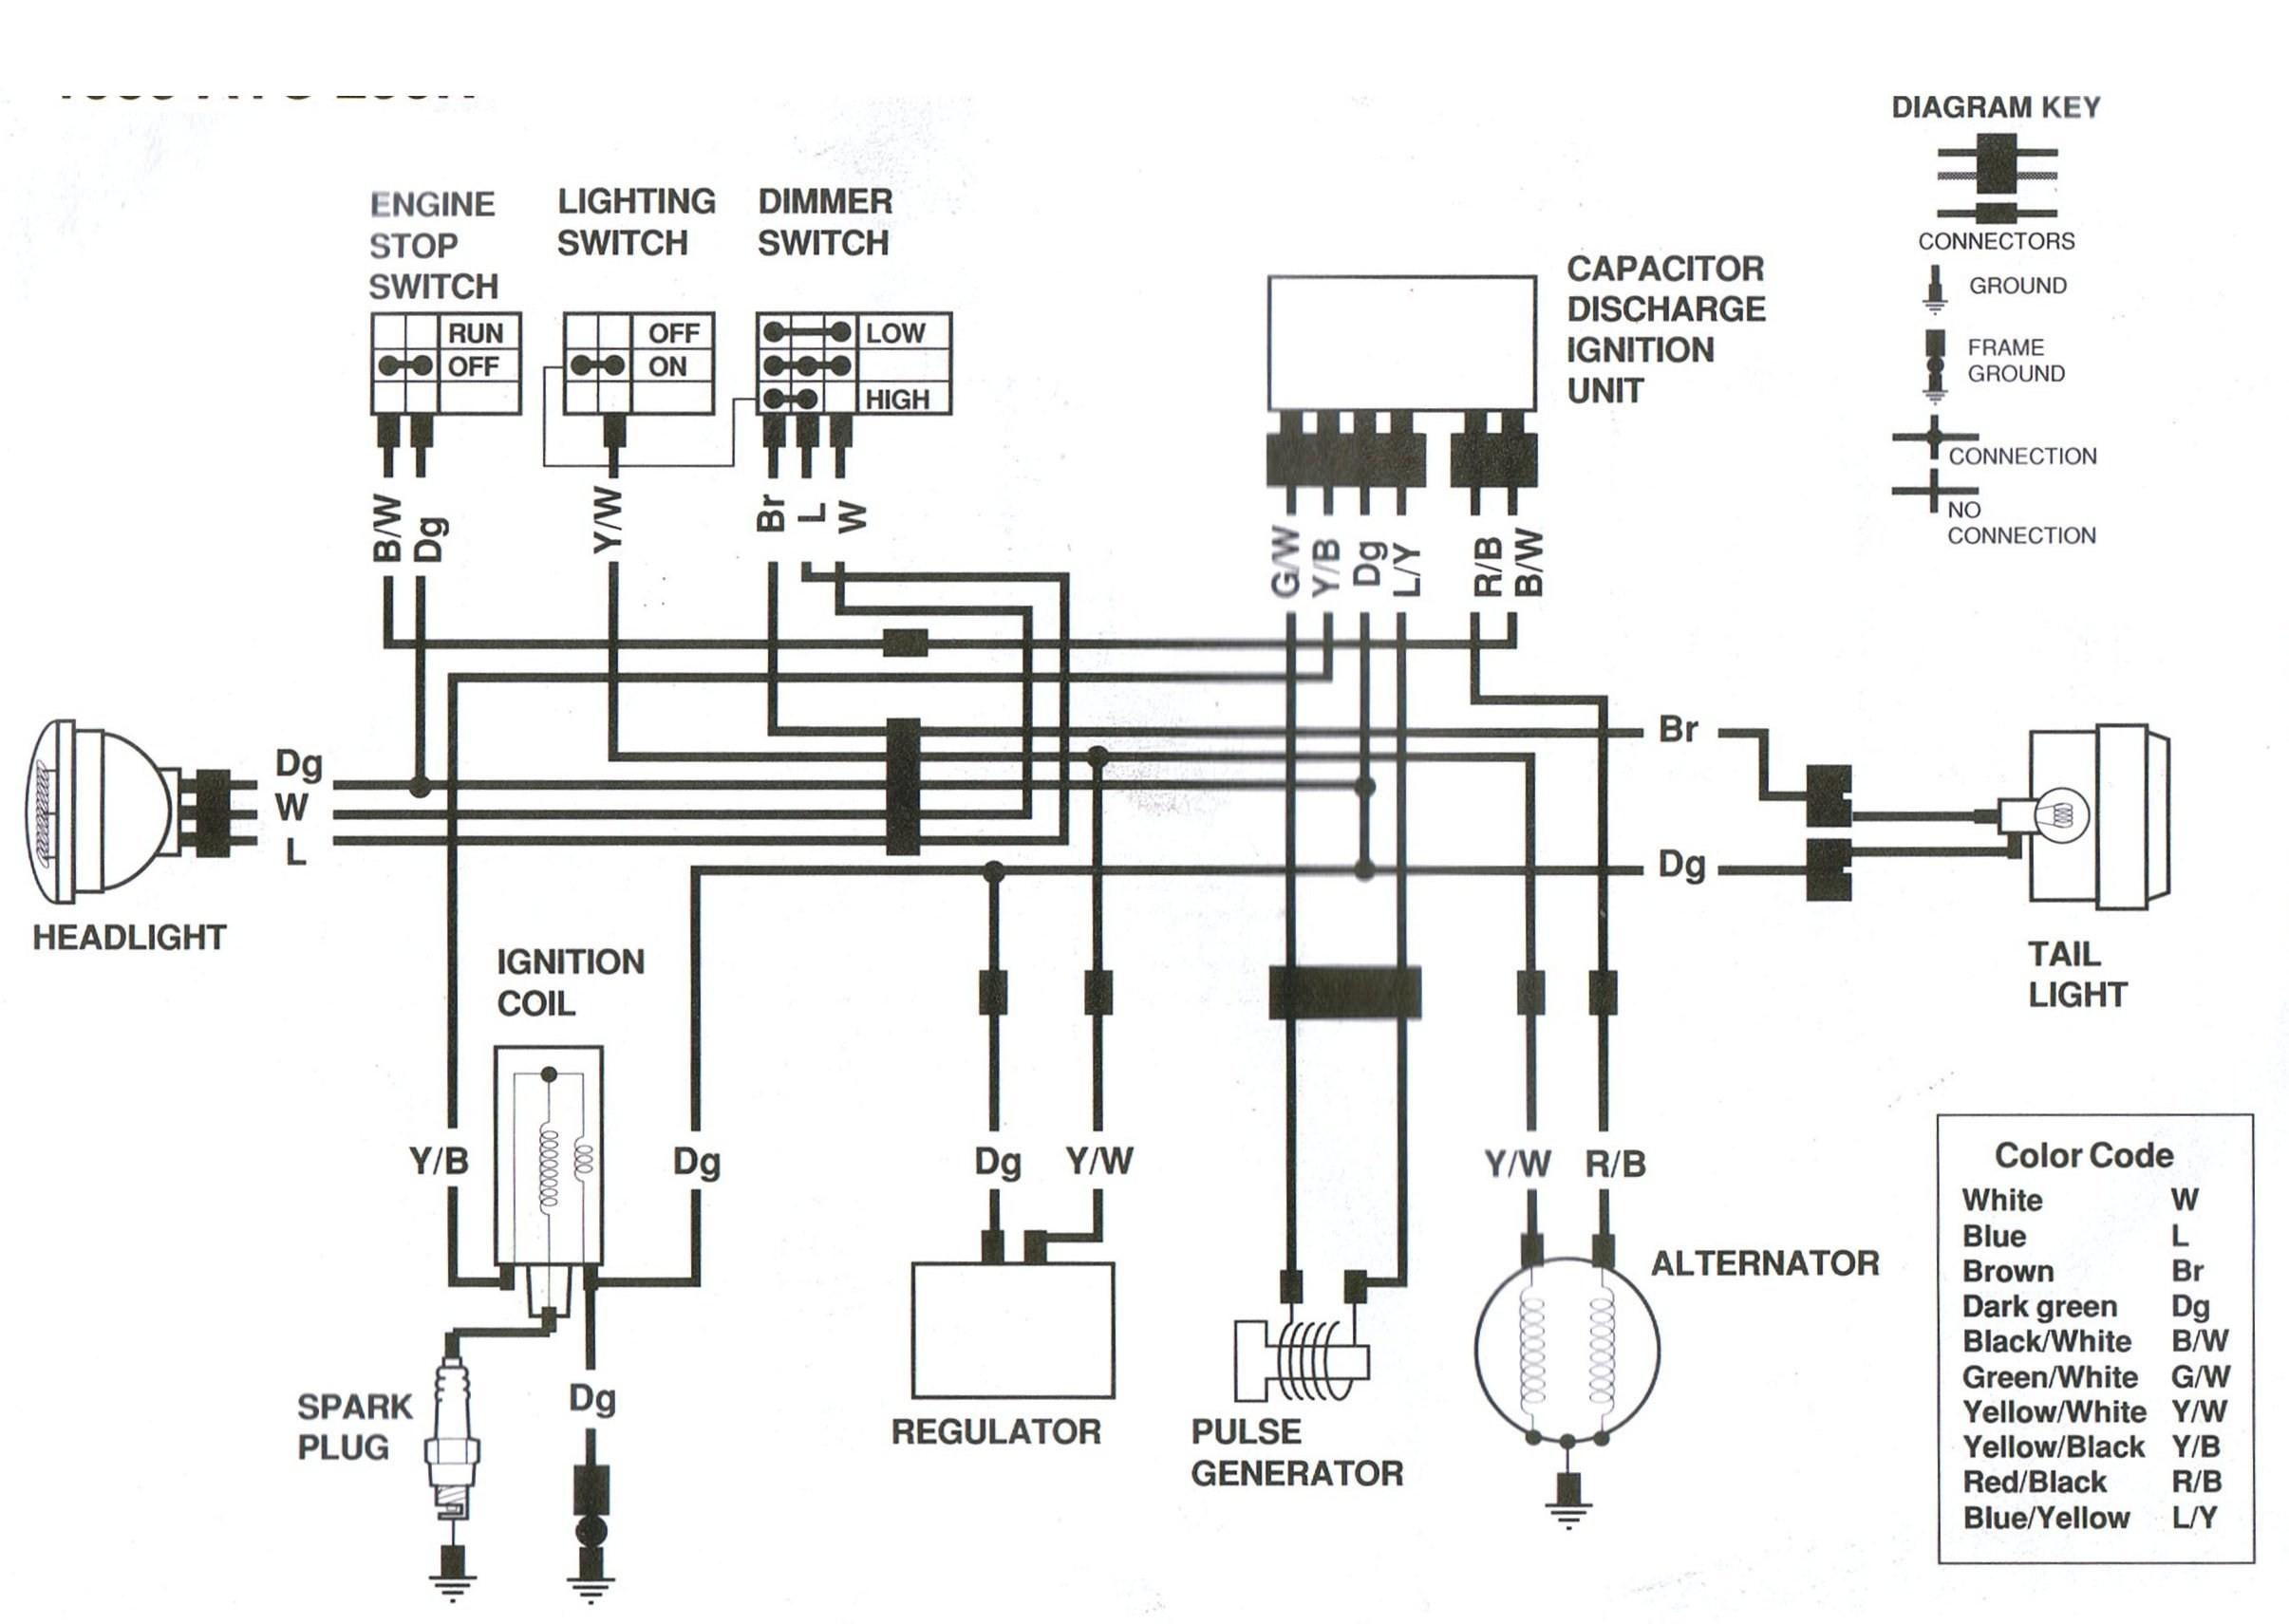 Will A Yamaha Kodiak 450 Wiring Harness Work On A 400 Yamaha Warrior 350 Wiring Specs Wiring Diagram Schematic Of Will A Yamaha Kodiak 450 Wiring Harness Work On A 400